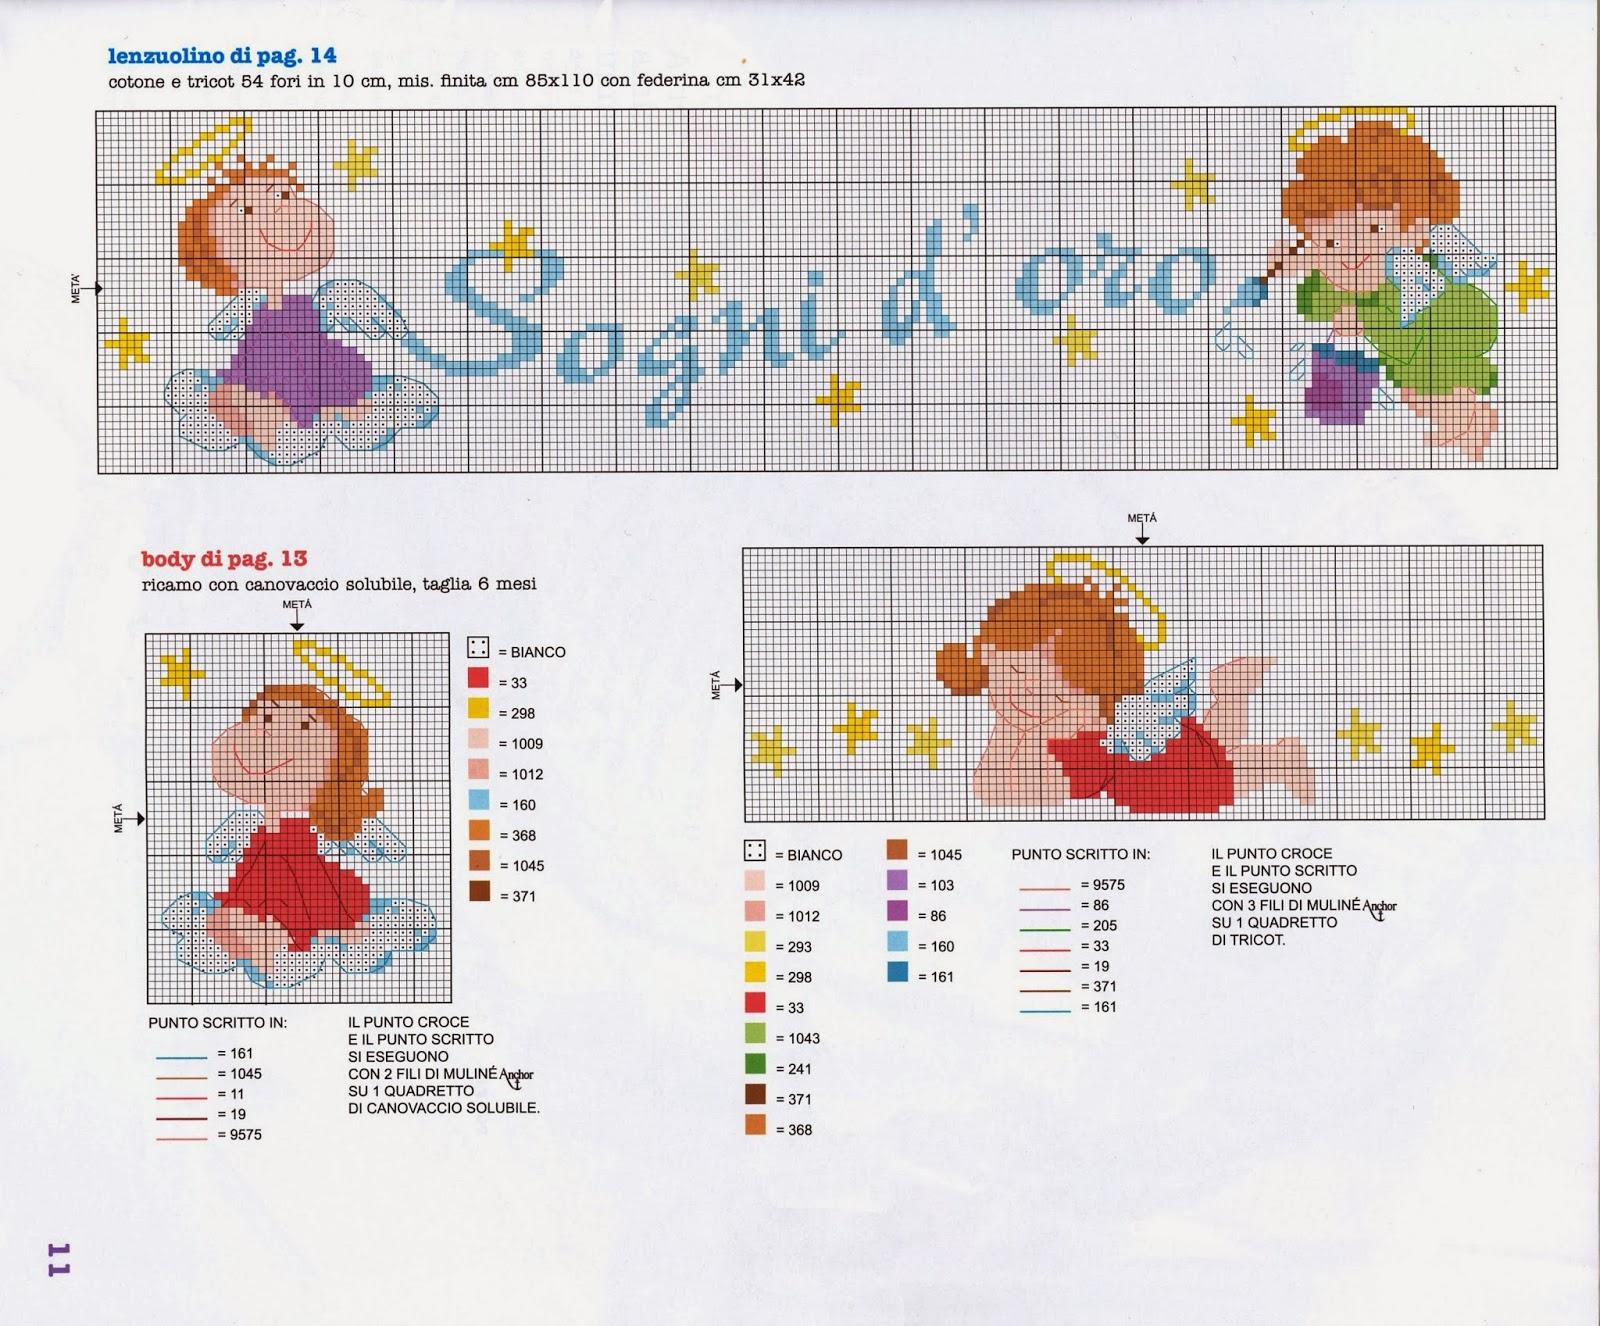 Ricami e schemi a punto croce gratuiti tanti schemi punto for Lenzuolini punto croce schemi